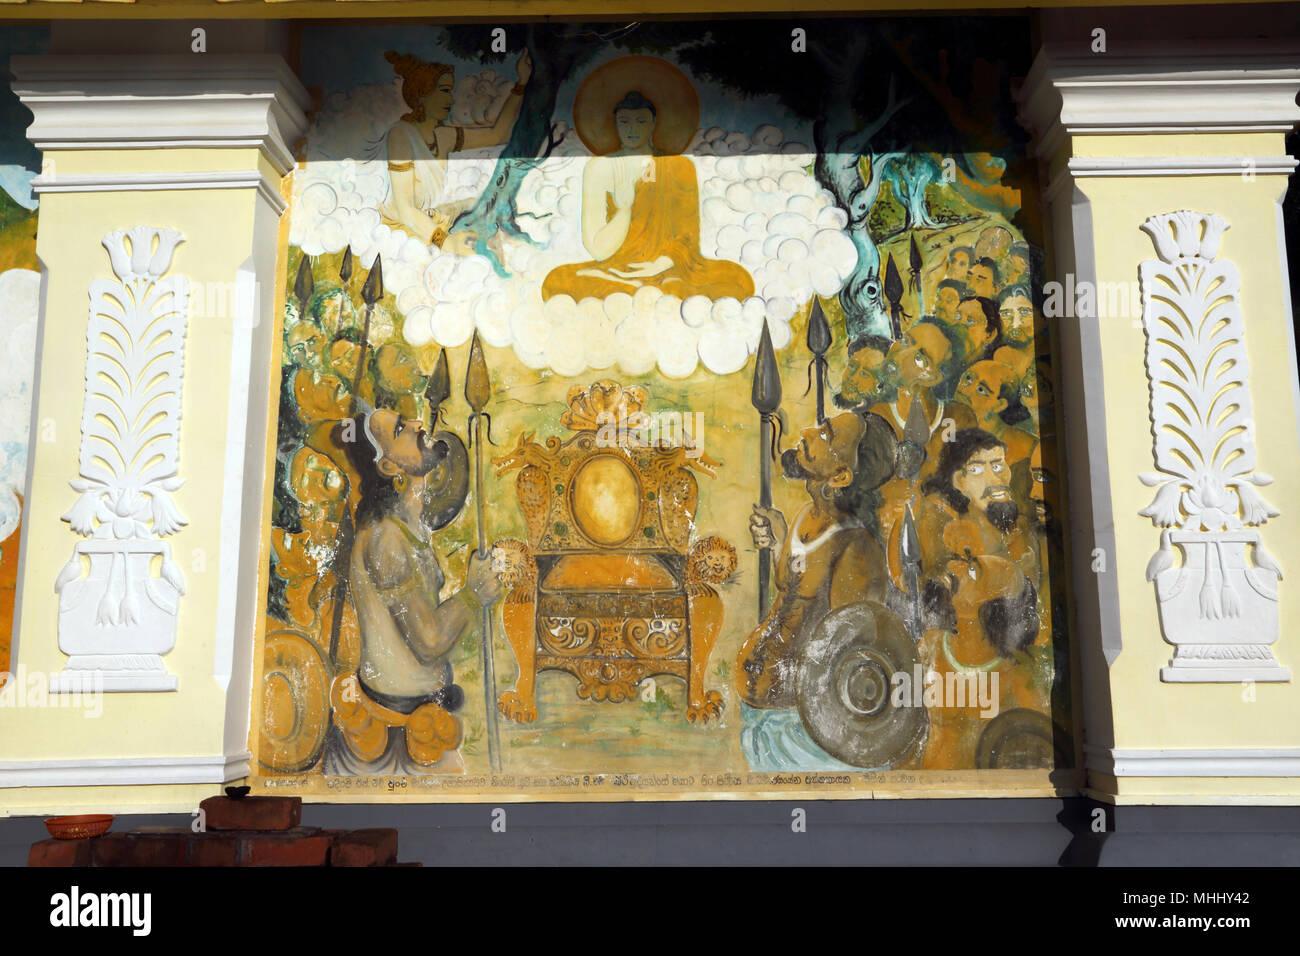 Art Painting Buddha Buddha Stock Photos & Art Painting Buddha Buddha ...